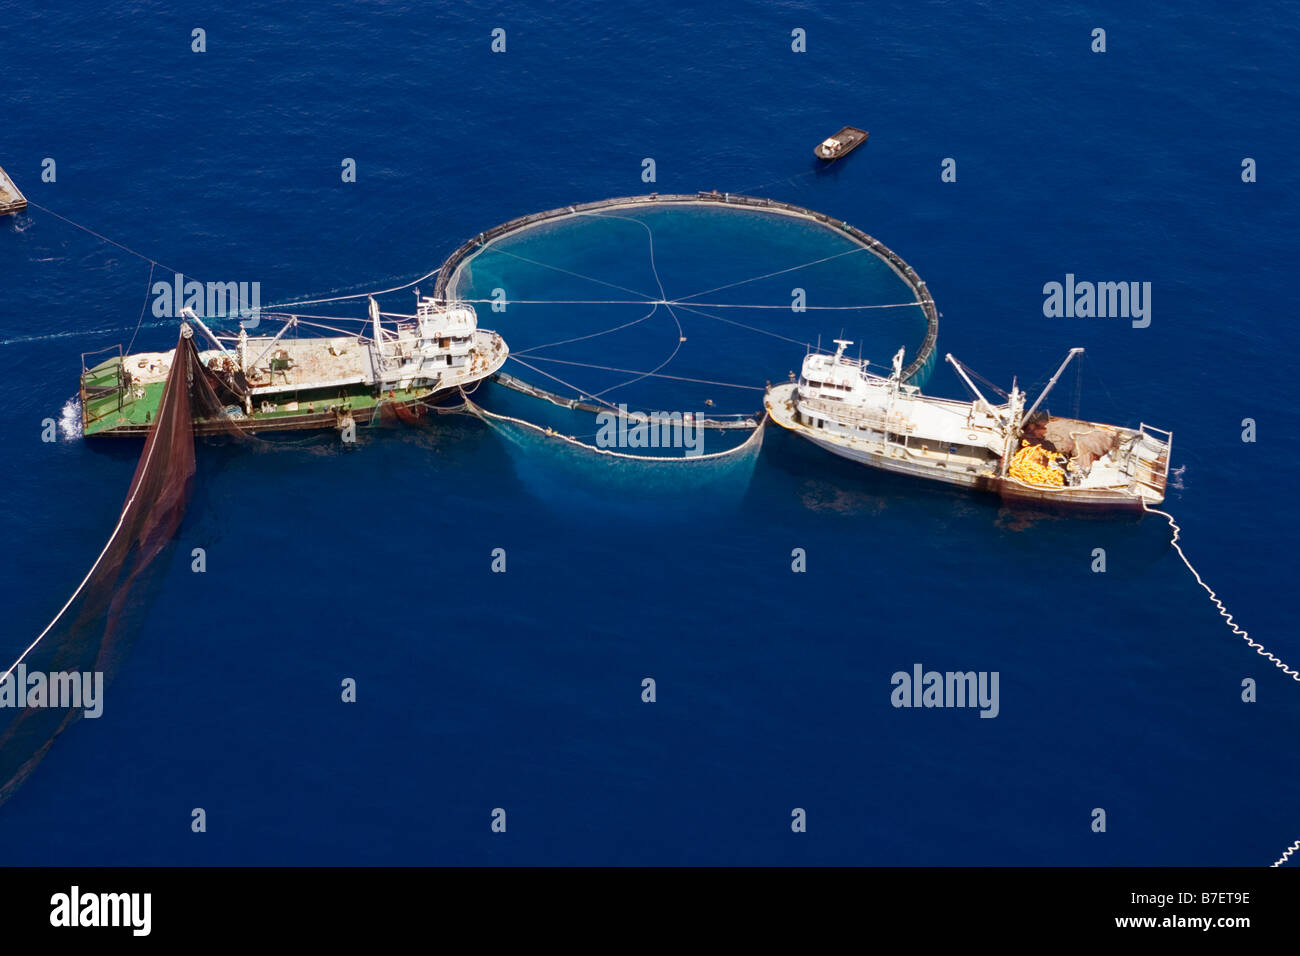 Turkish tuna fleet purse seine fishing for bluefin tuna for Purse seine fishing